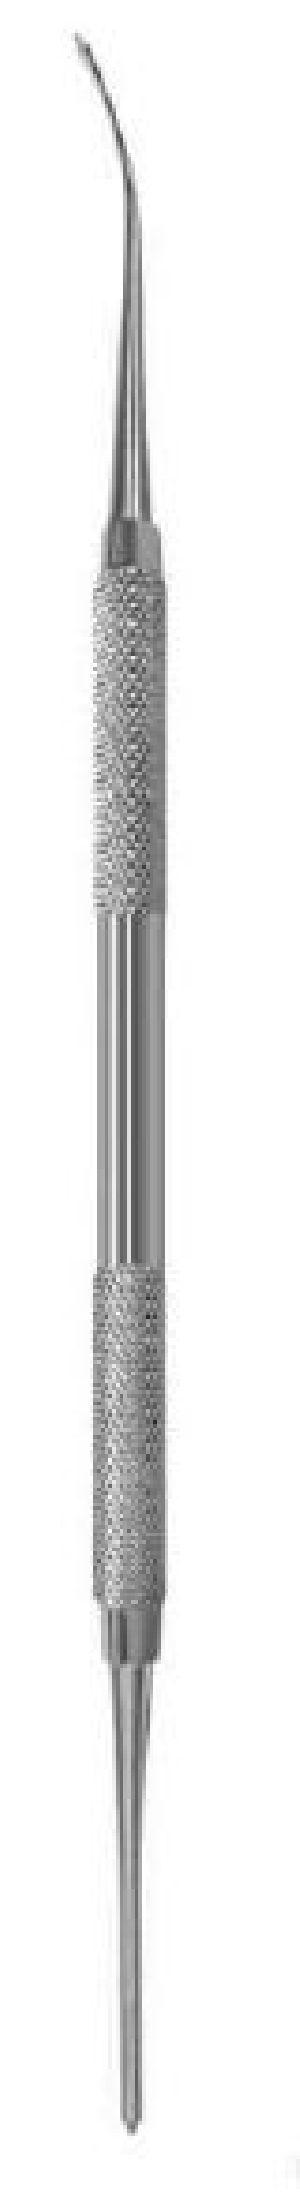 Membrane Placement Instrument 02